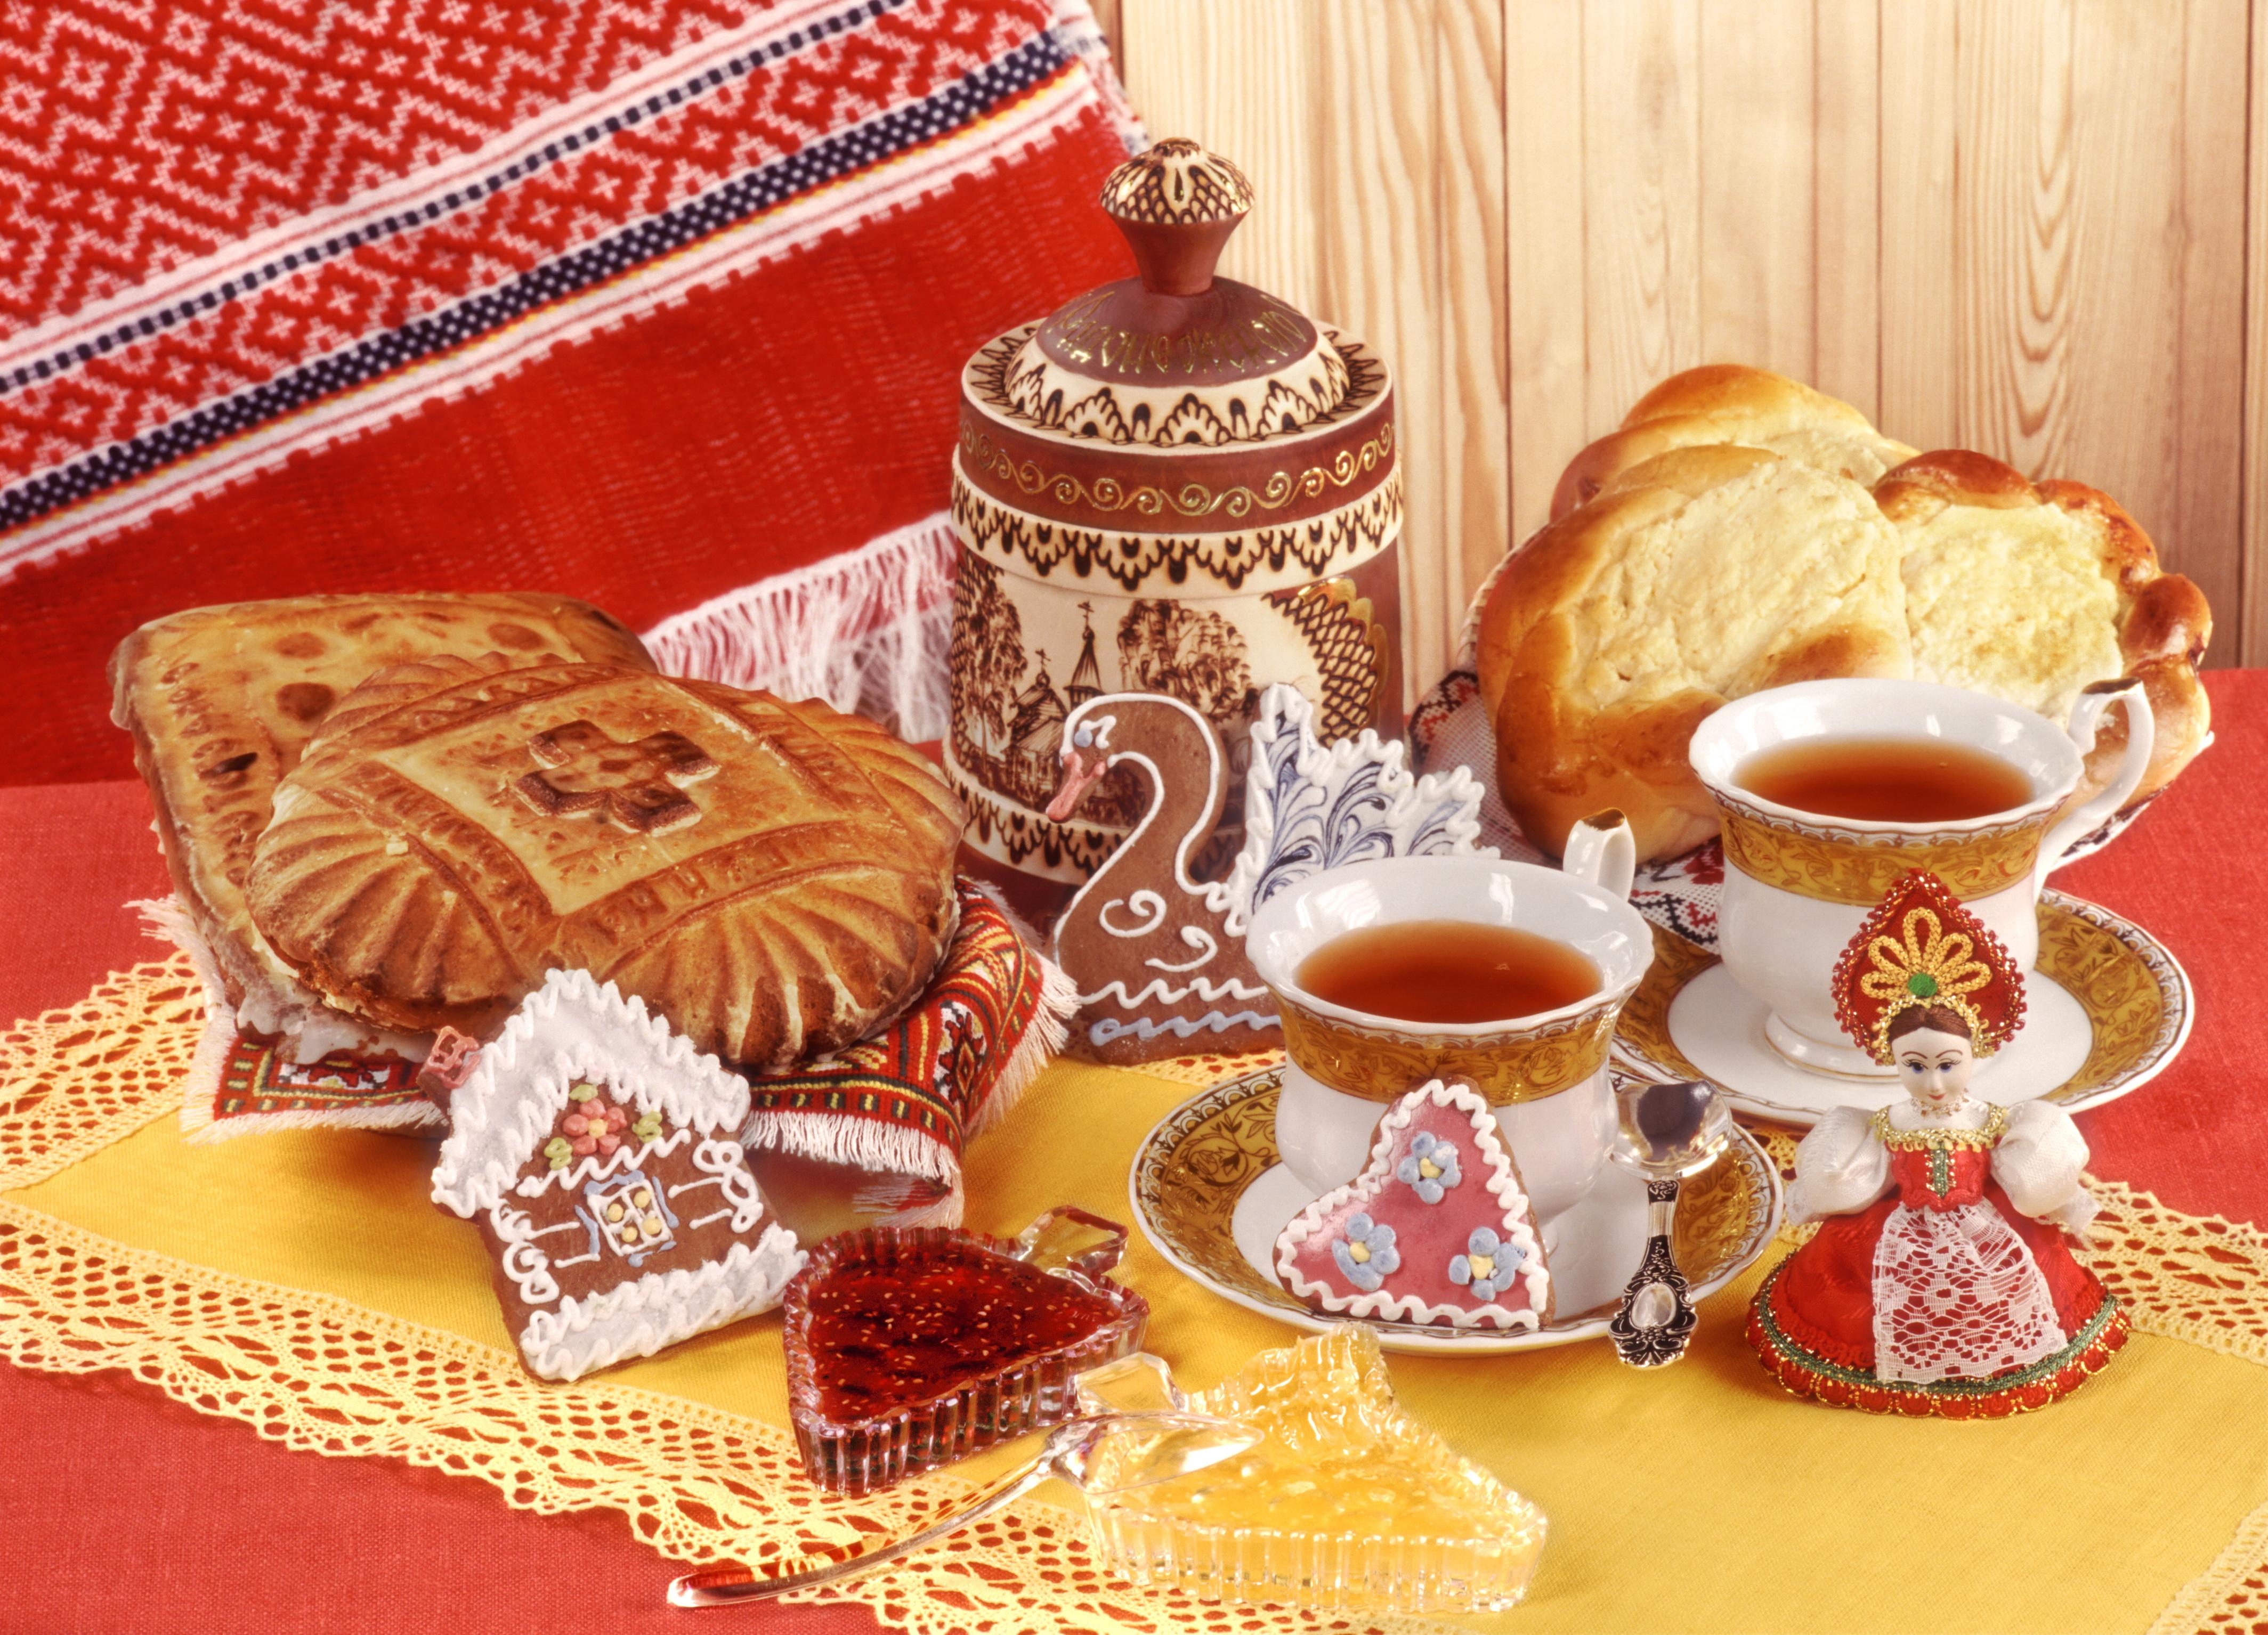 http://s1.1zoom.ru/big3/330/342536-svetik.jpg